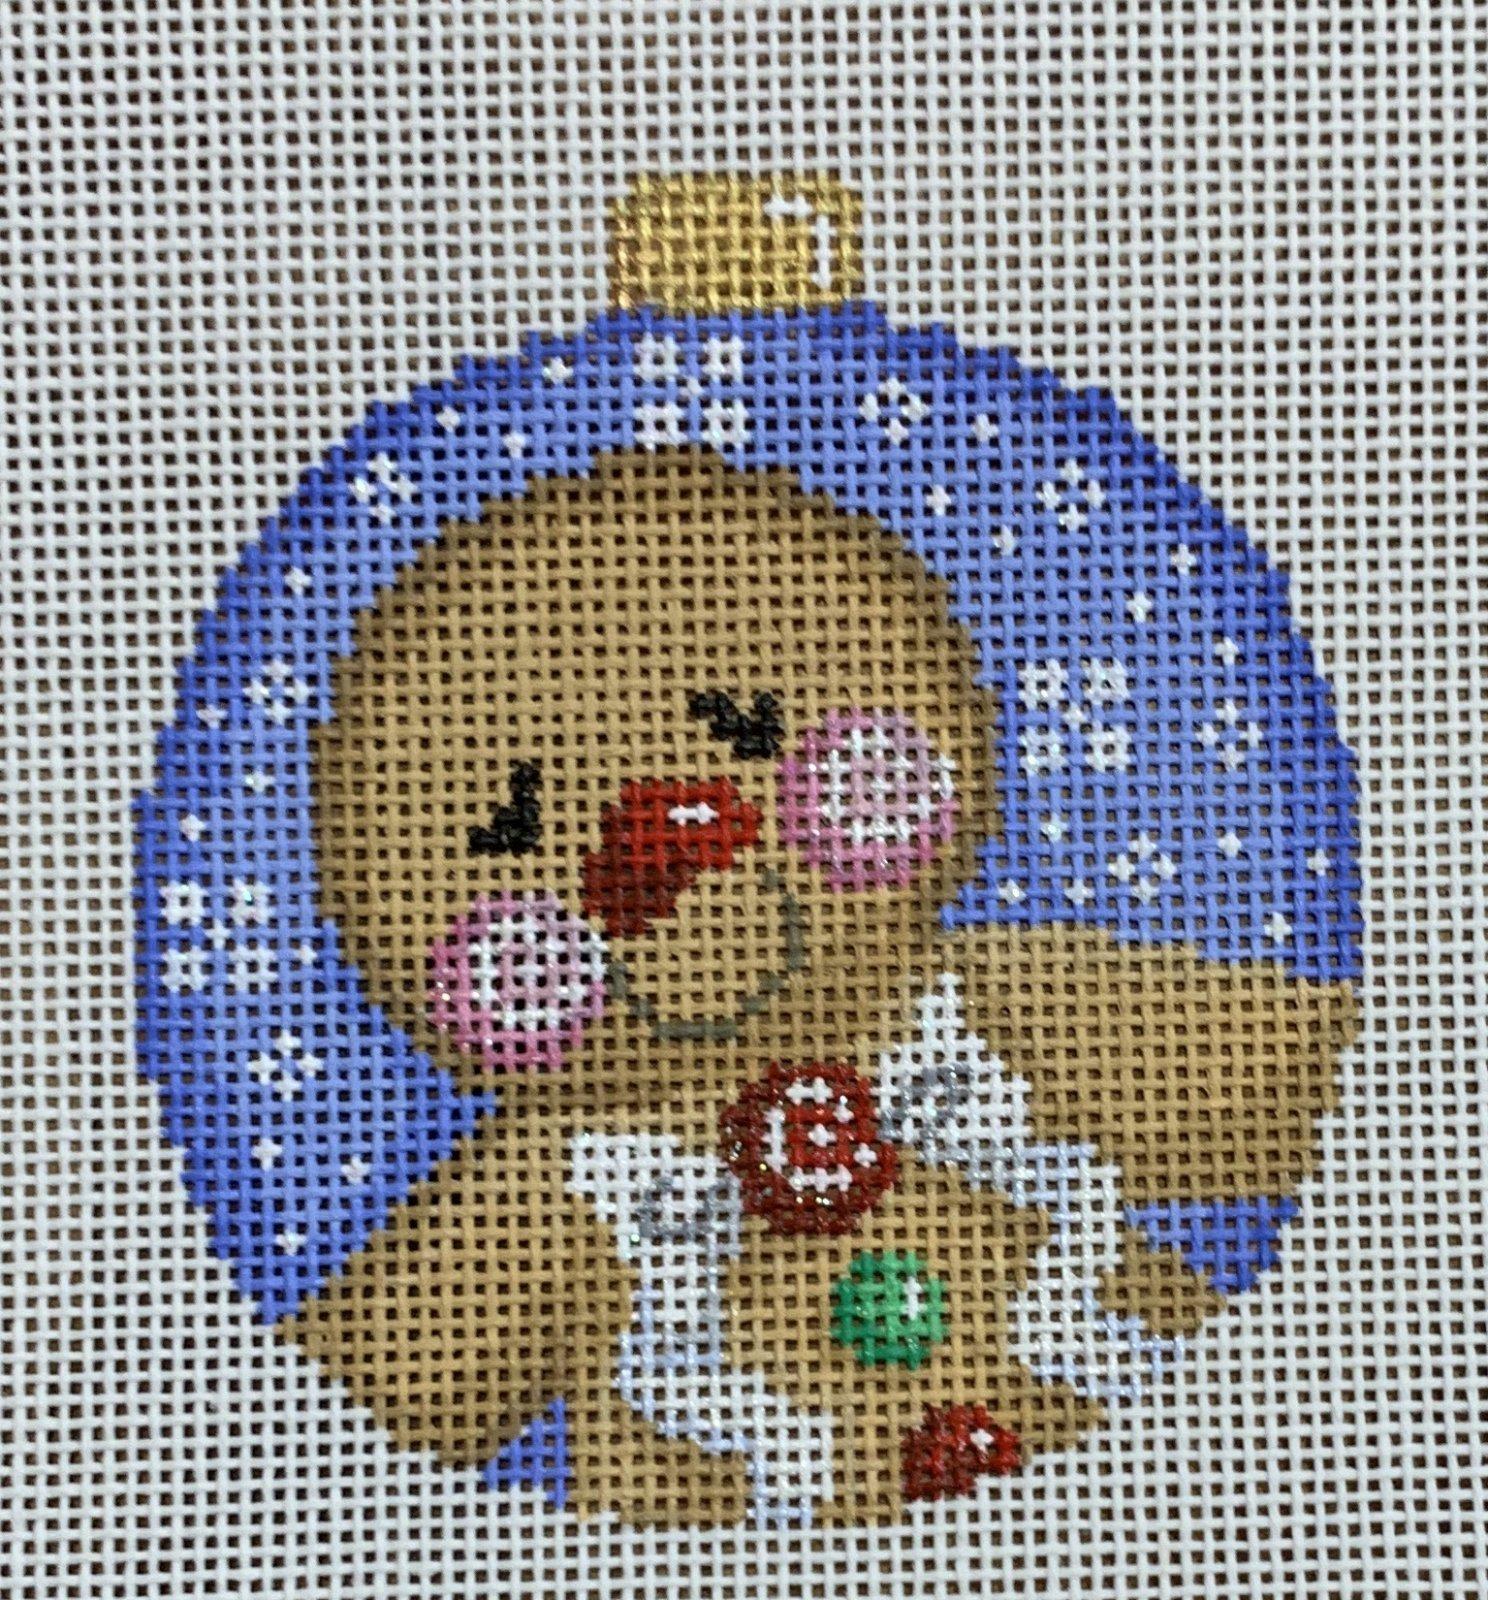 Gingerbread Boy Ball Ornament